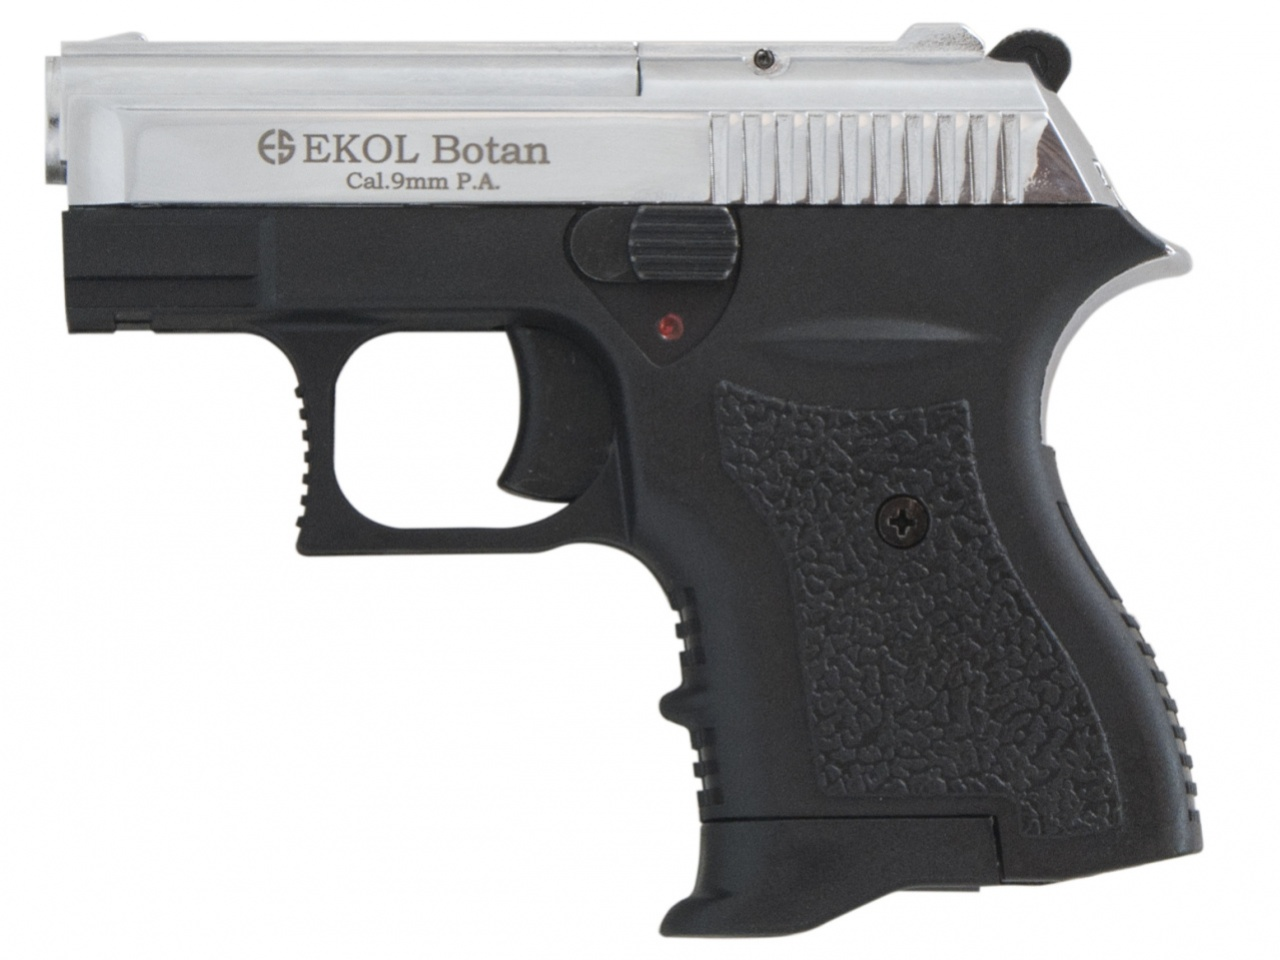 Pistolet gazowy Ekol Botan chrom kal.9mm